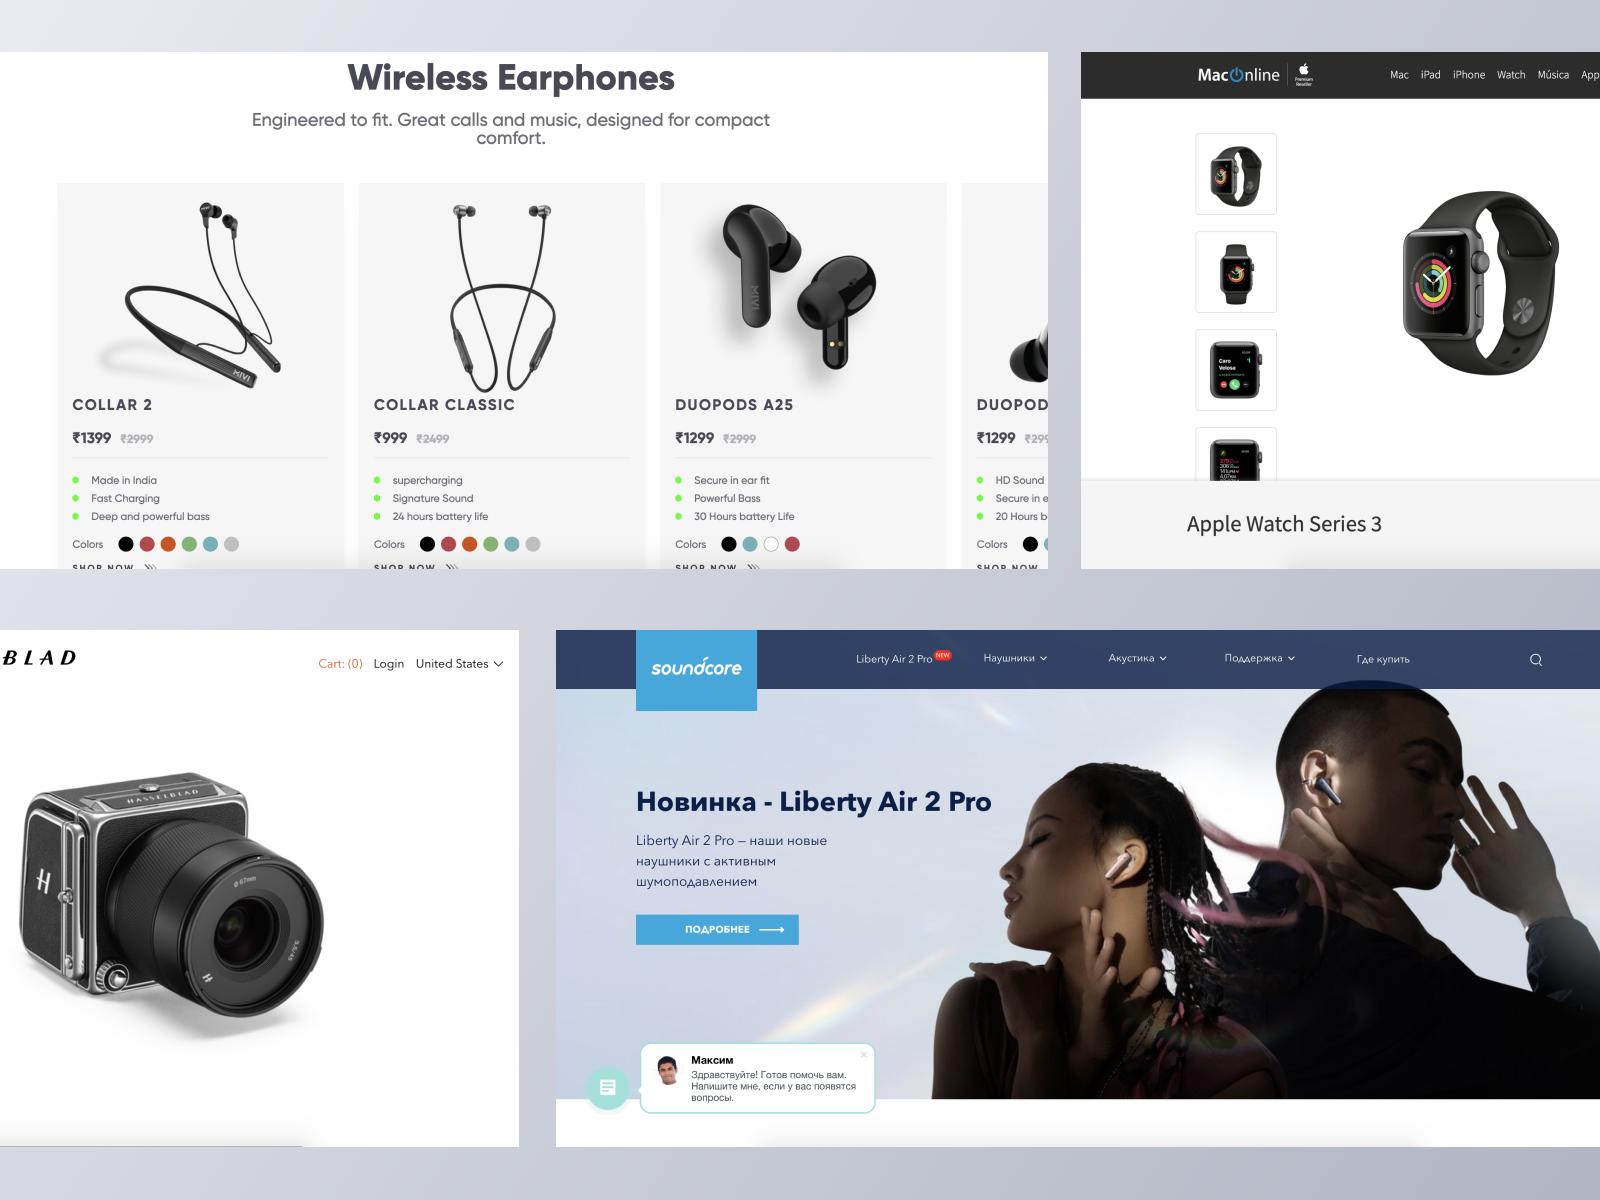 Consumer Electronics ecommerce websites using Spree Commerce